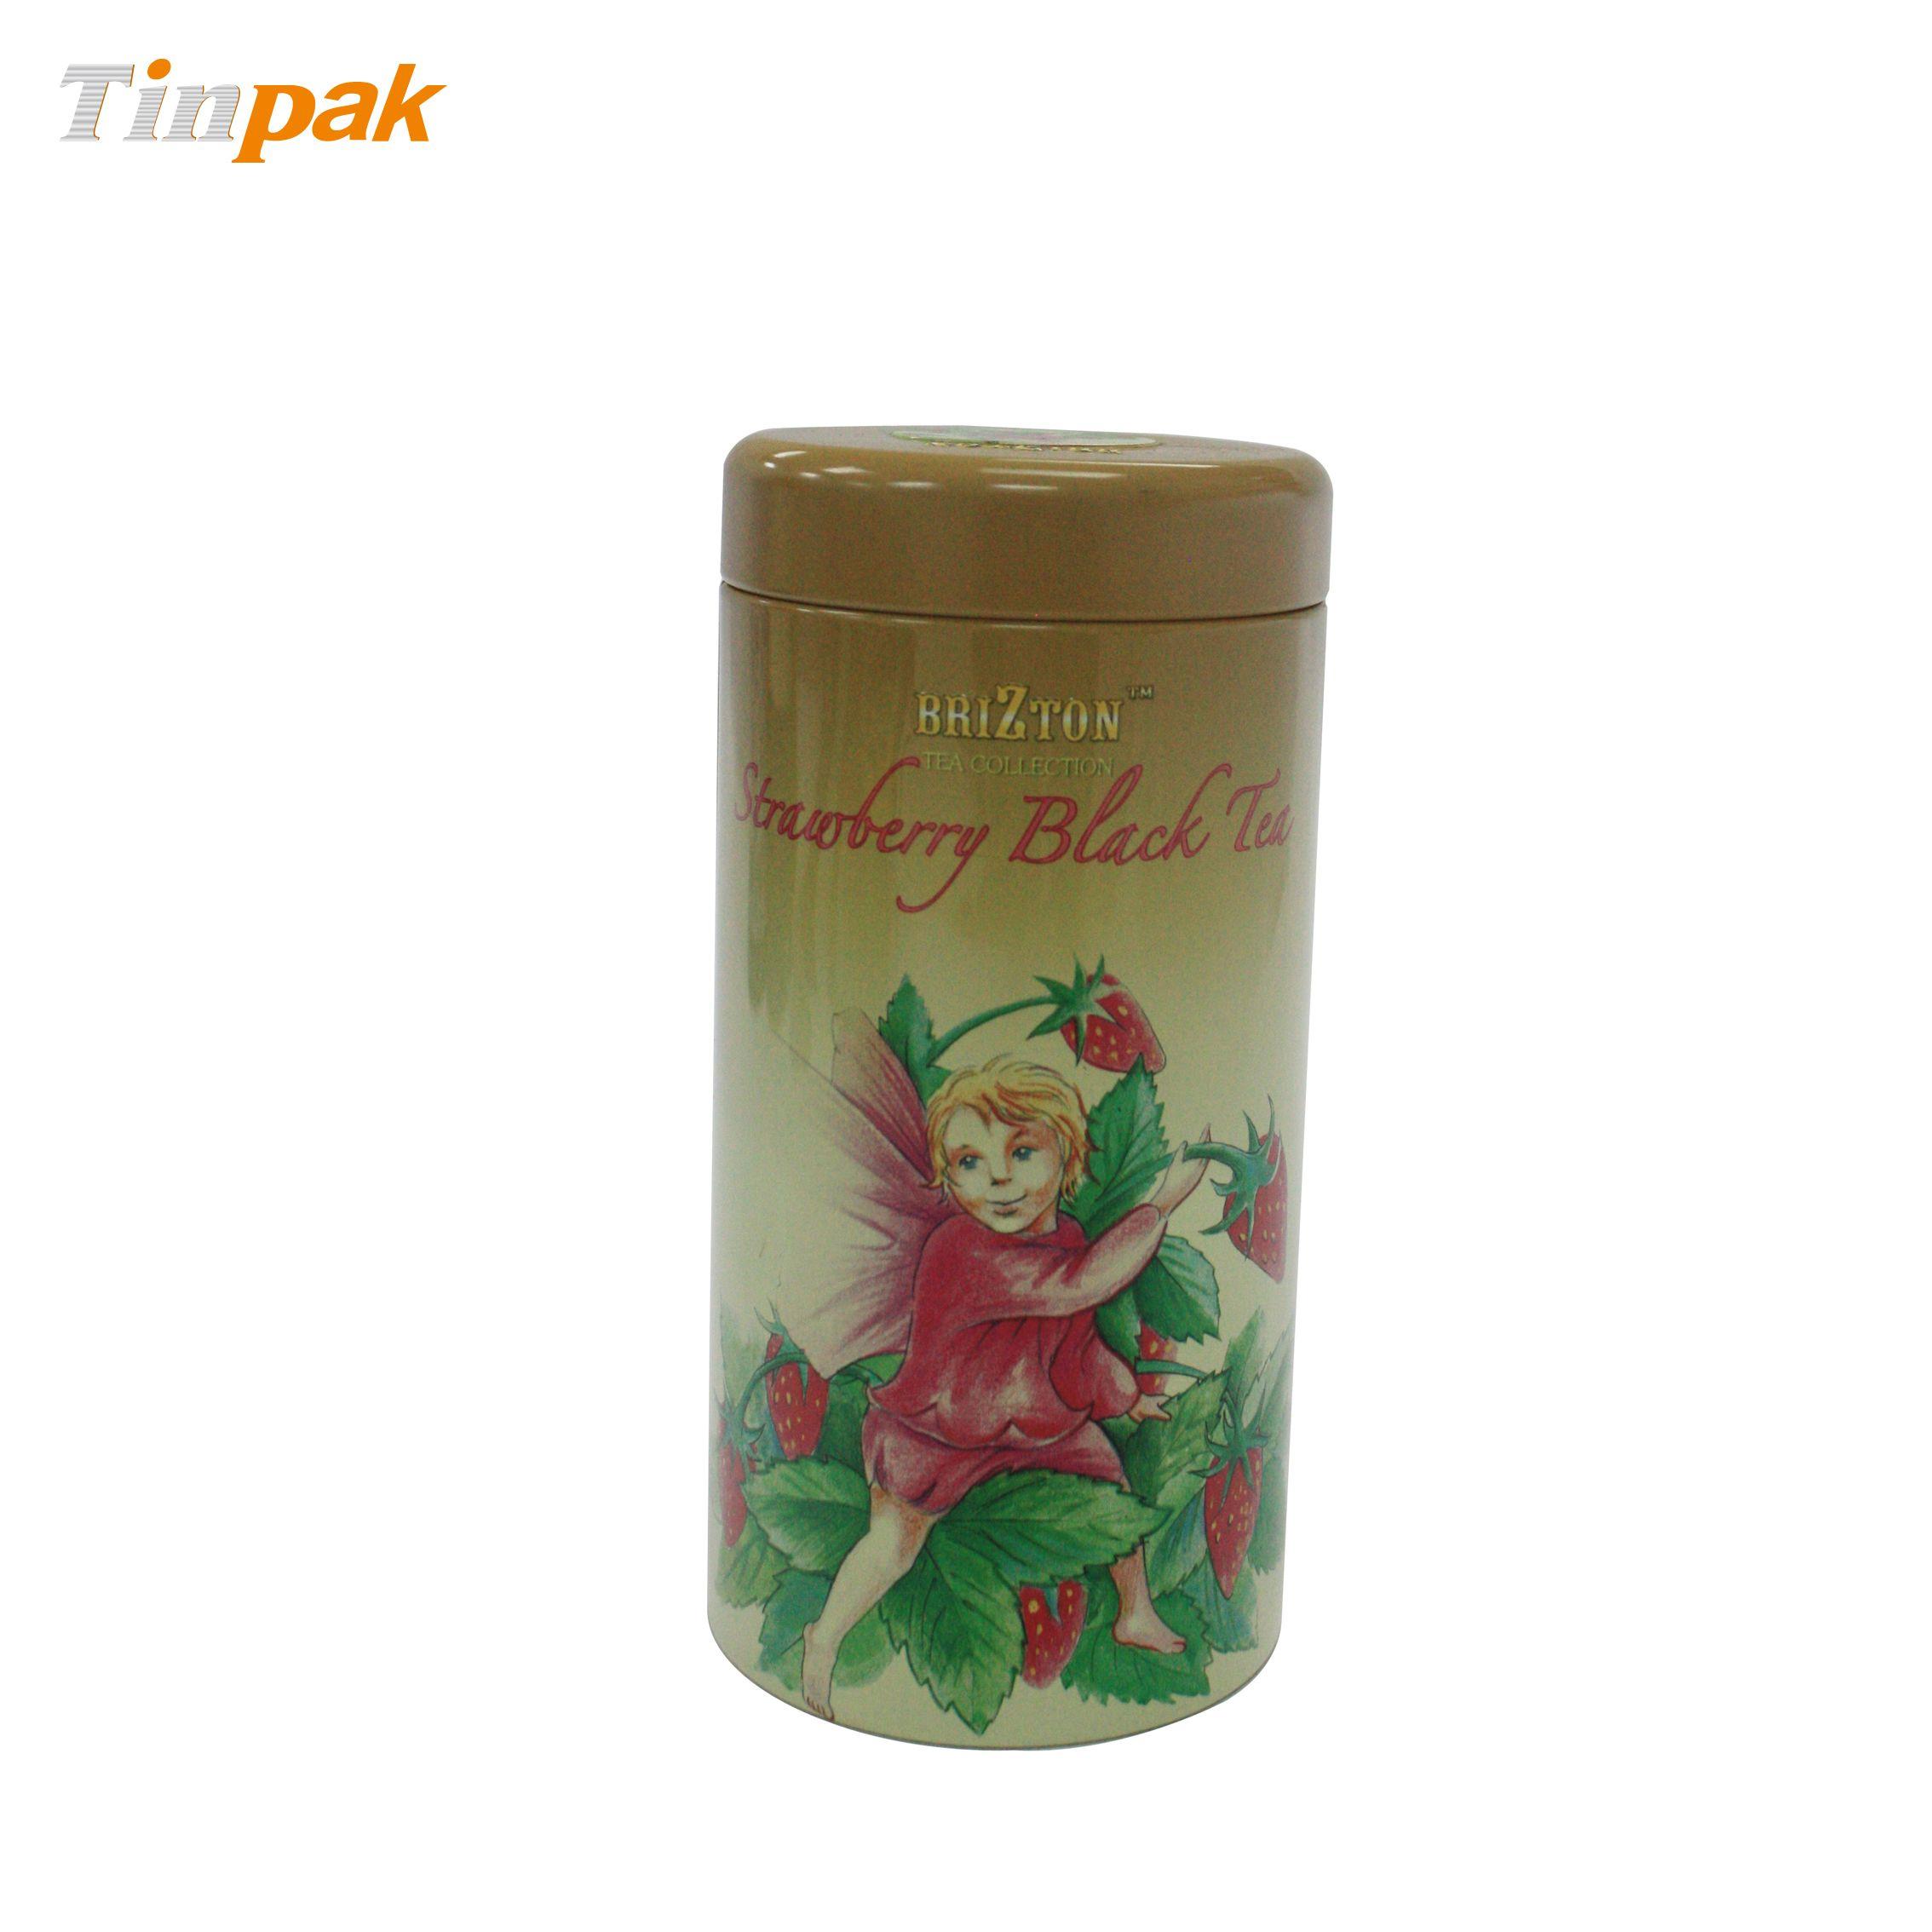 Empty metal tea tin case custom design http://www.tinpak.us/Products/emptymetalteatincase.html